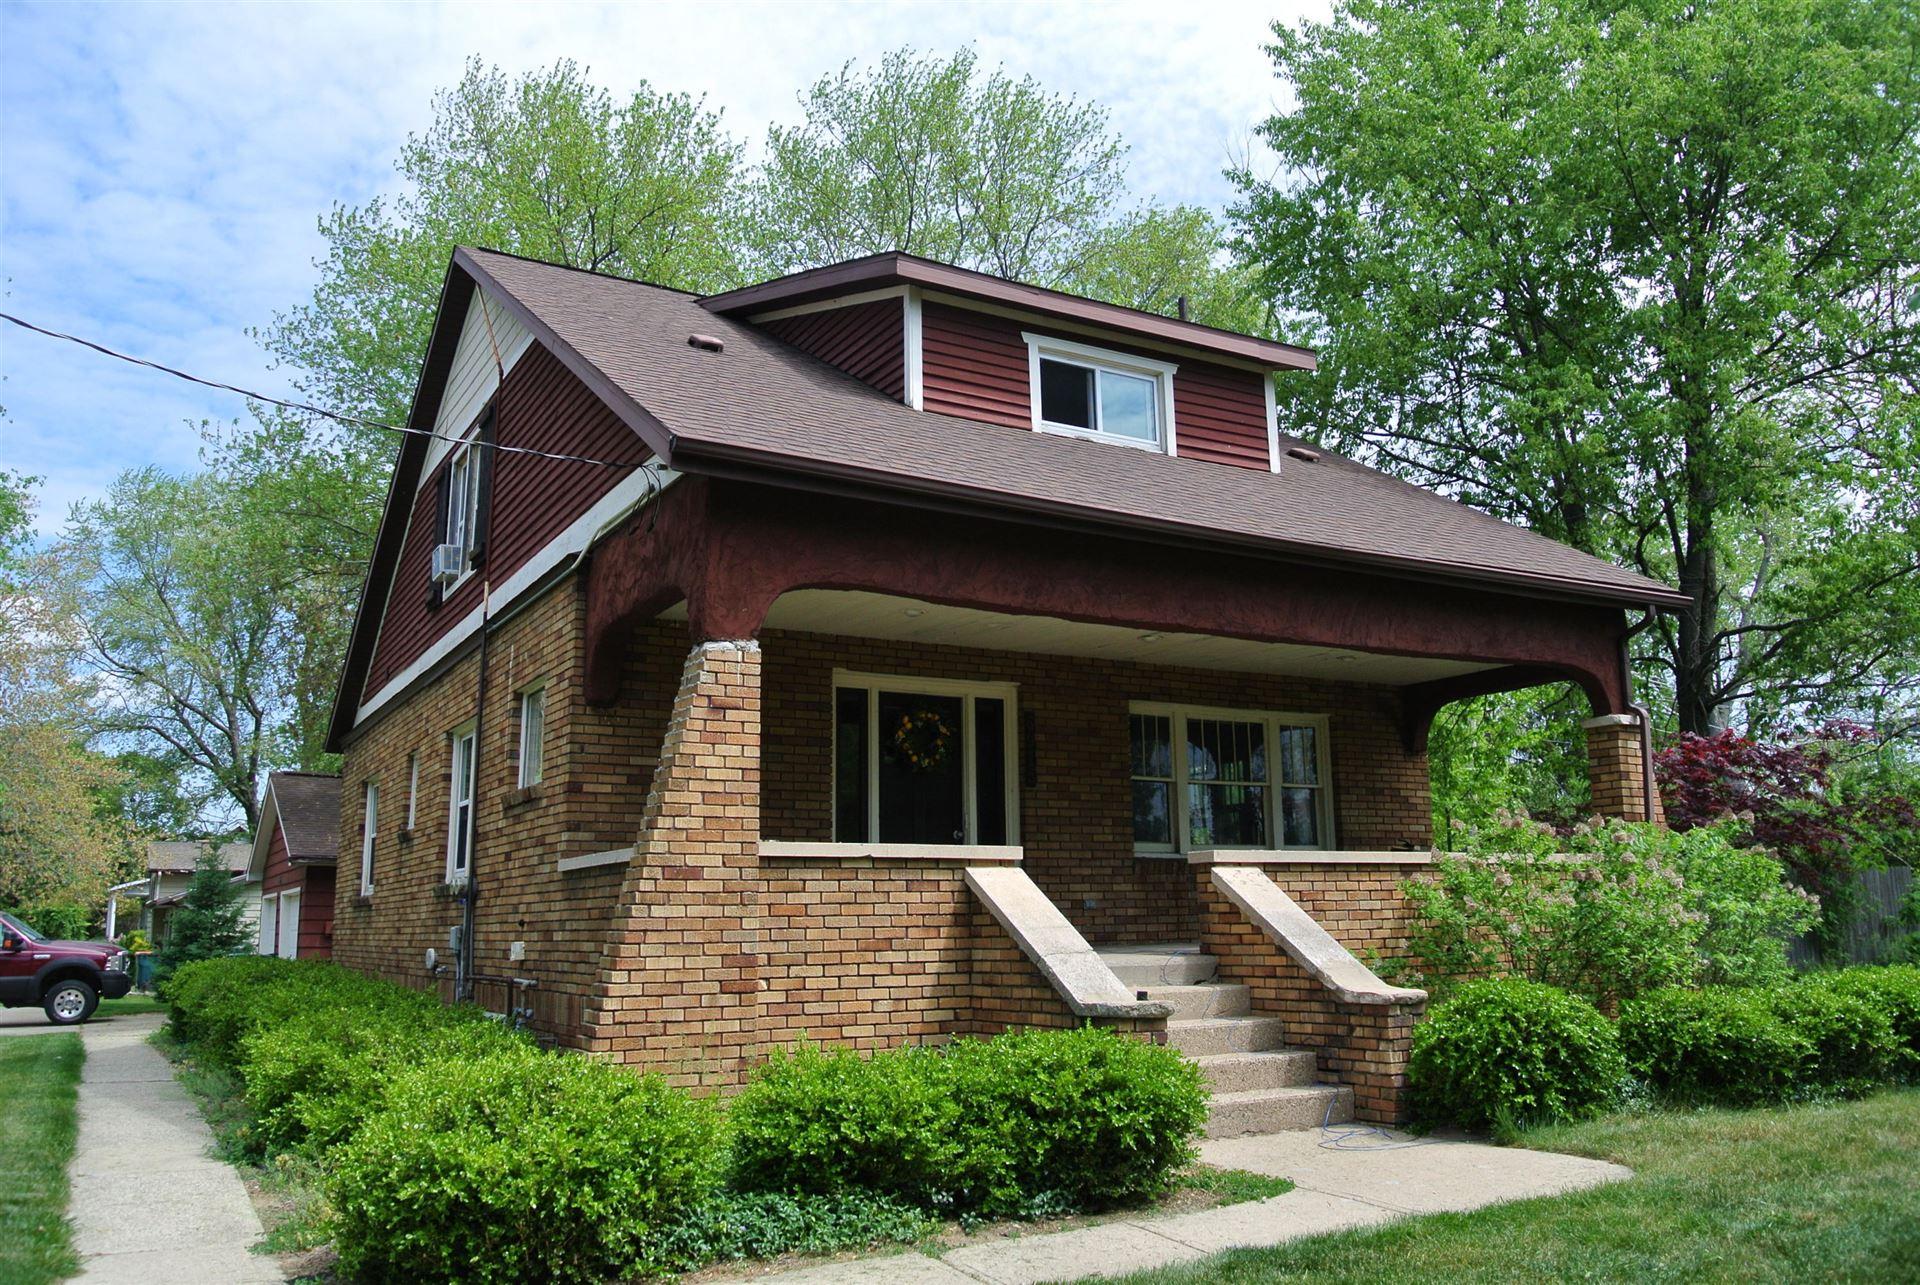 6915 Lake Michigan Drive, Allendale, MI 49401 - MLS#: 21023873